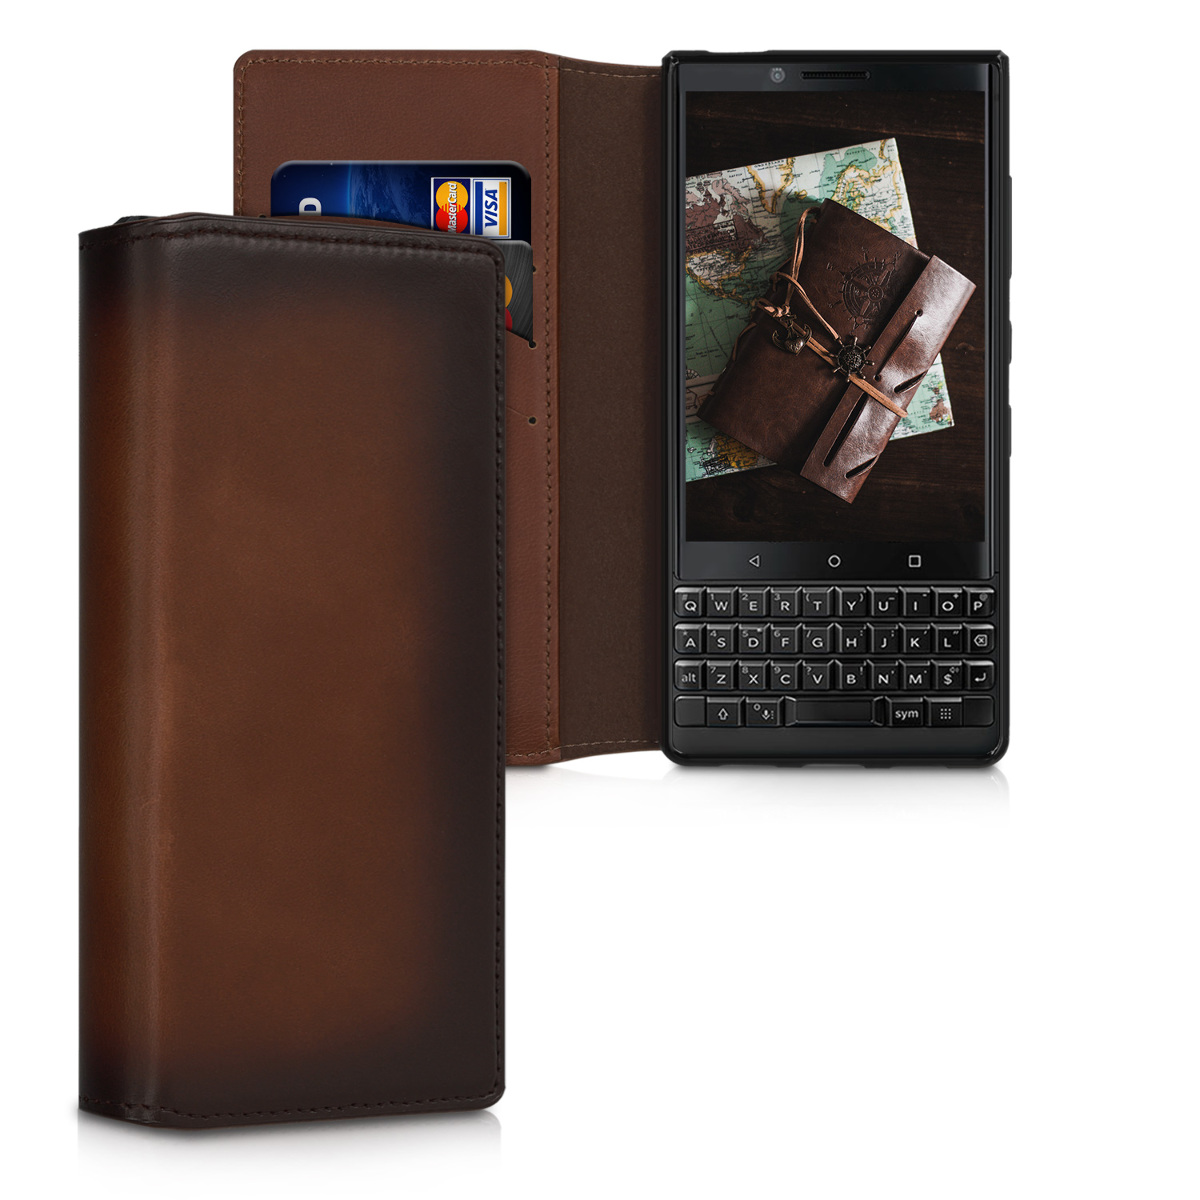 Kalibri Δερμάτινη Θήκη - Πορτοφόλι Blackberry KEYtwo (Key2) - Vintage Brown (49123.133)